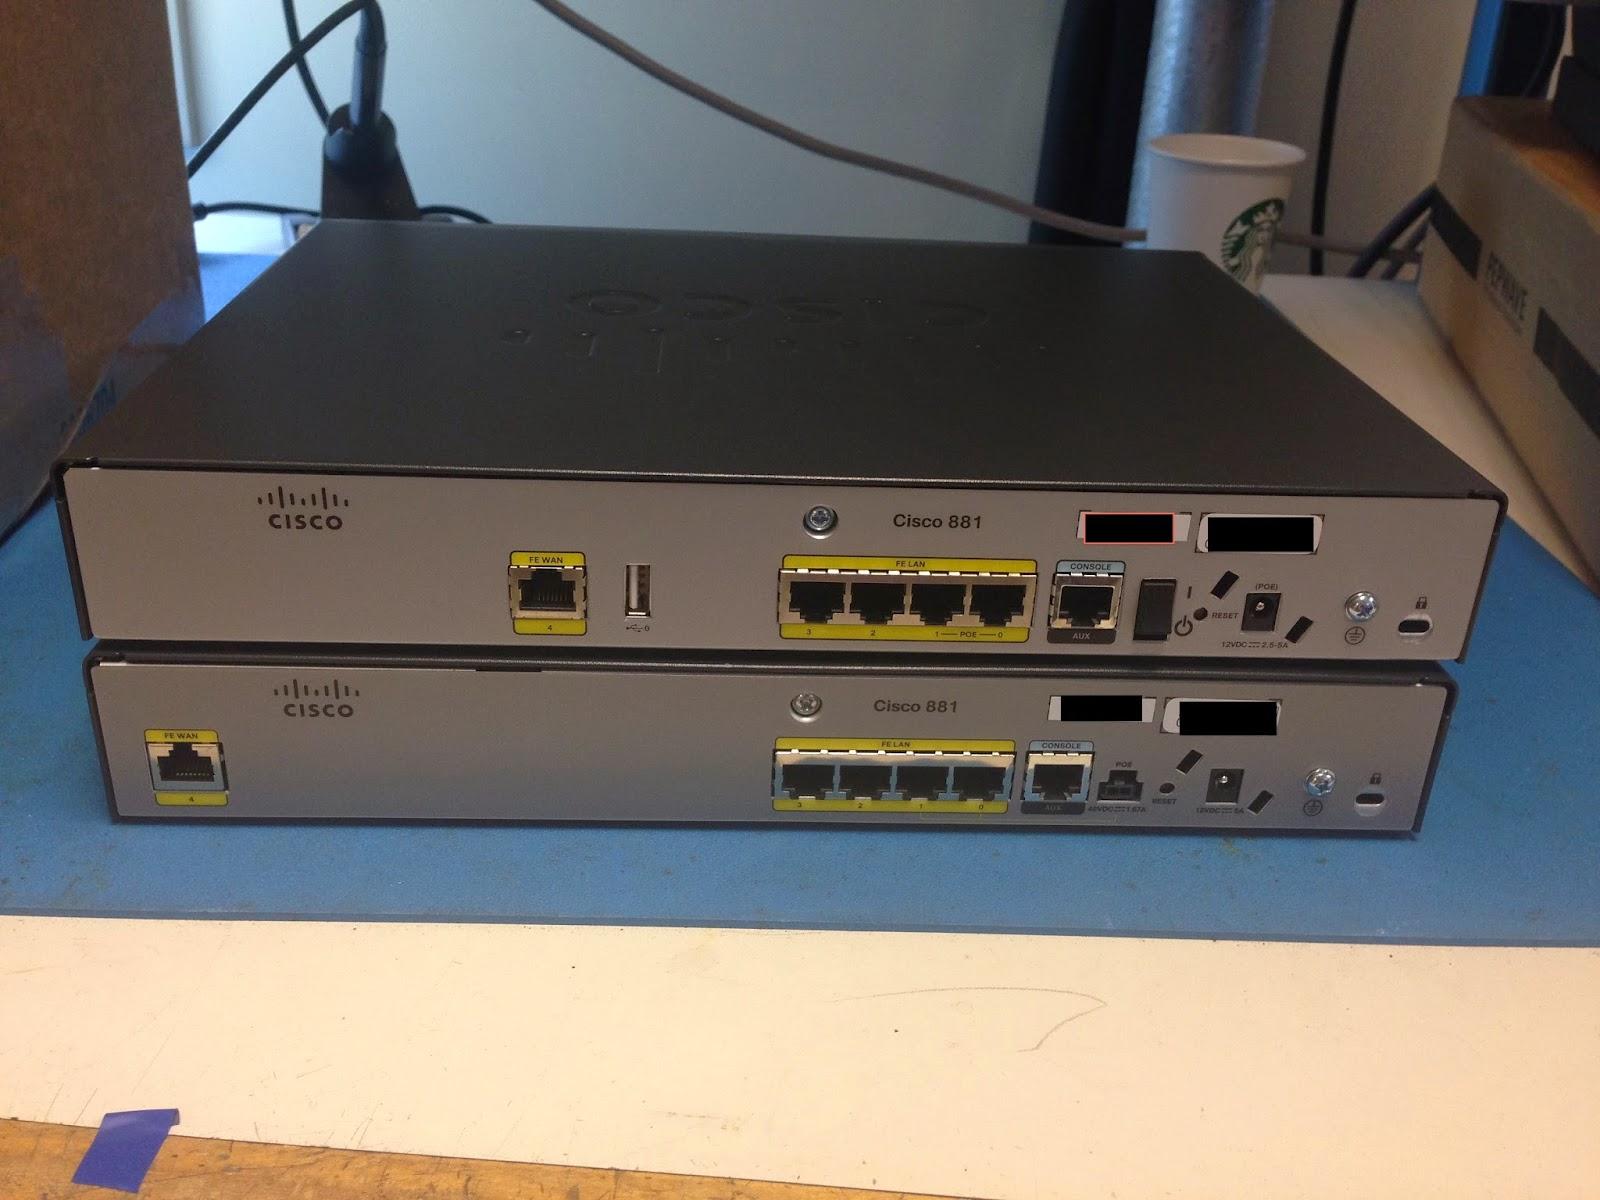 Fragmentation Needed: Cisco 881 or Cisco 881?